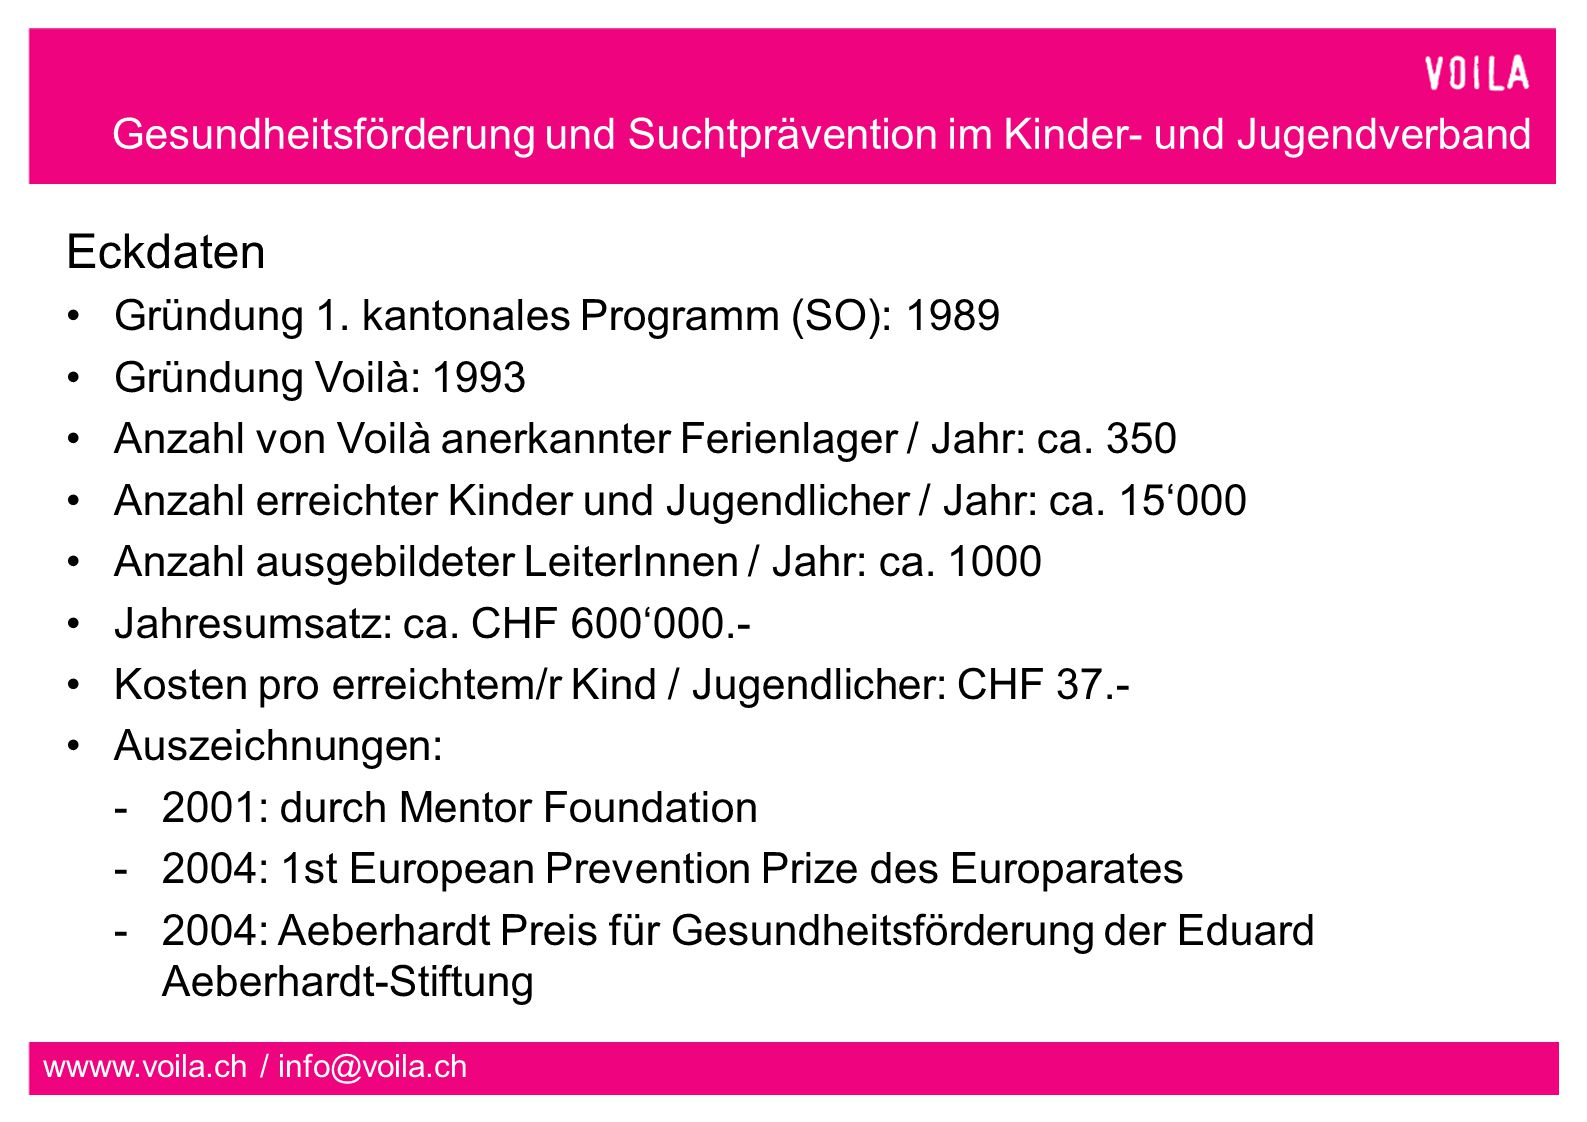 Eckdaten Gründung 1. kantonales Programm (SO): 1989